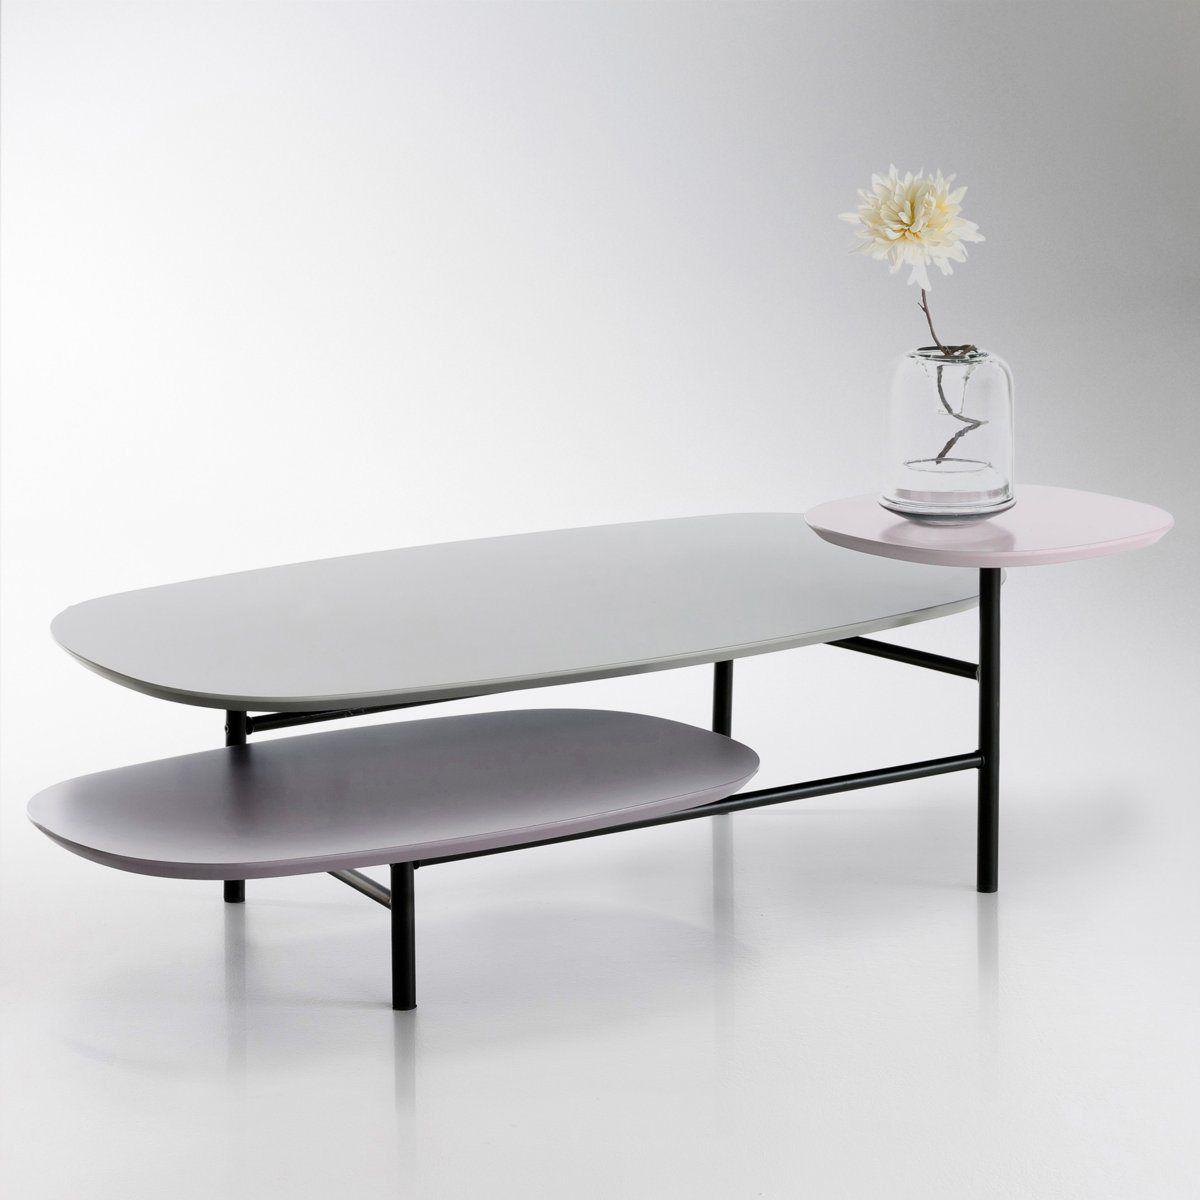 Table Basse 3 Plateaux Guillaume Delvigne Table Basse Table Basse Bois Table Basse Palette